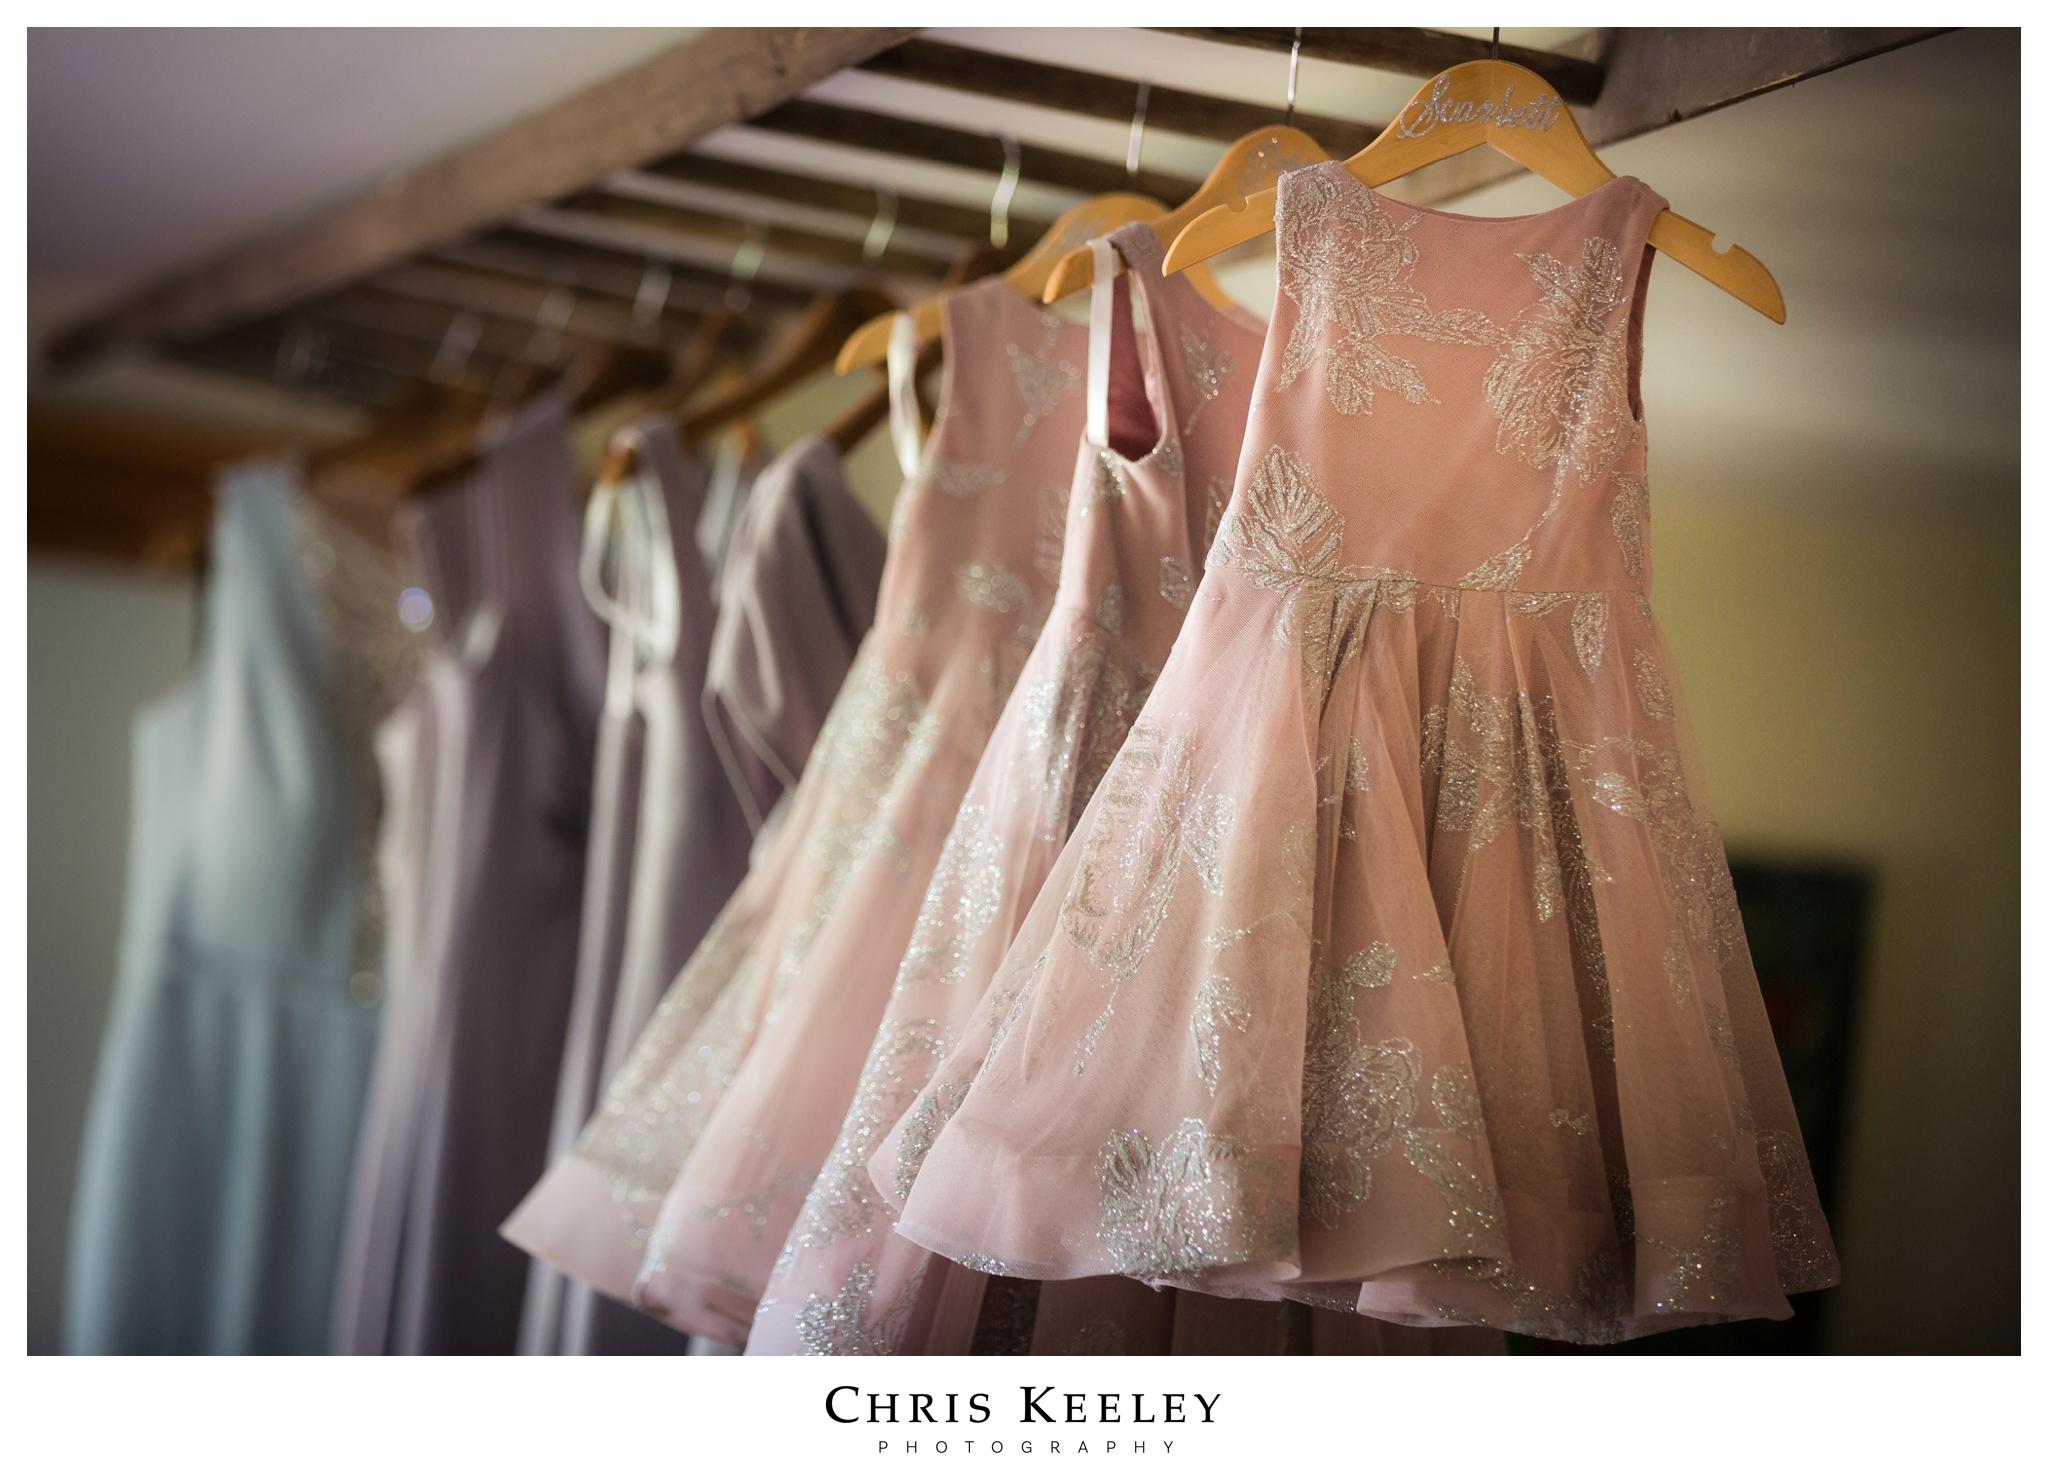 hayley-paige-flower-girl-dresses.jpg